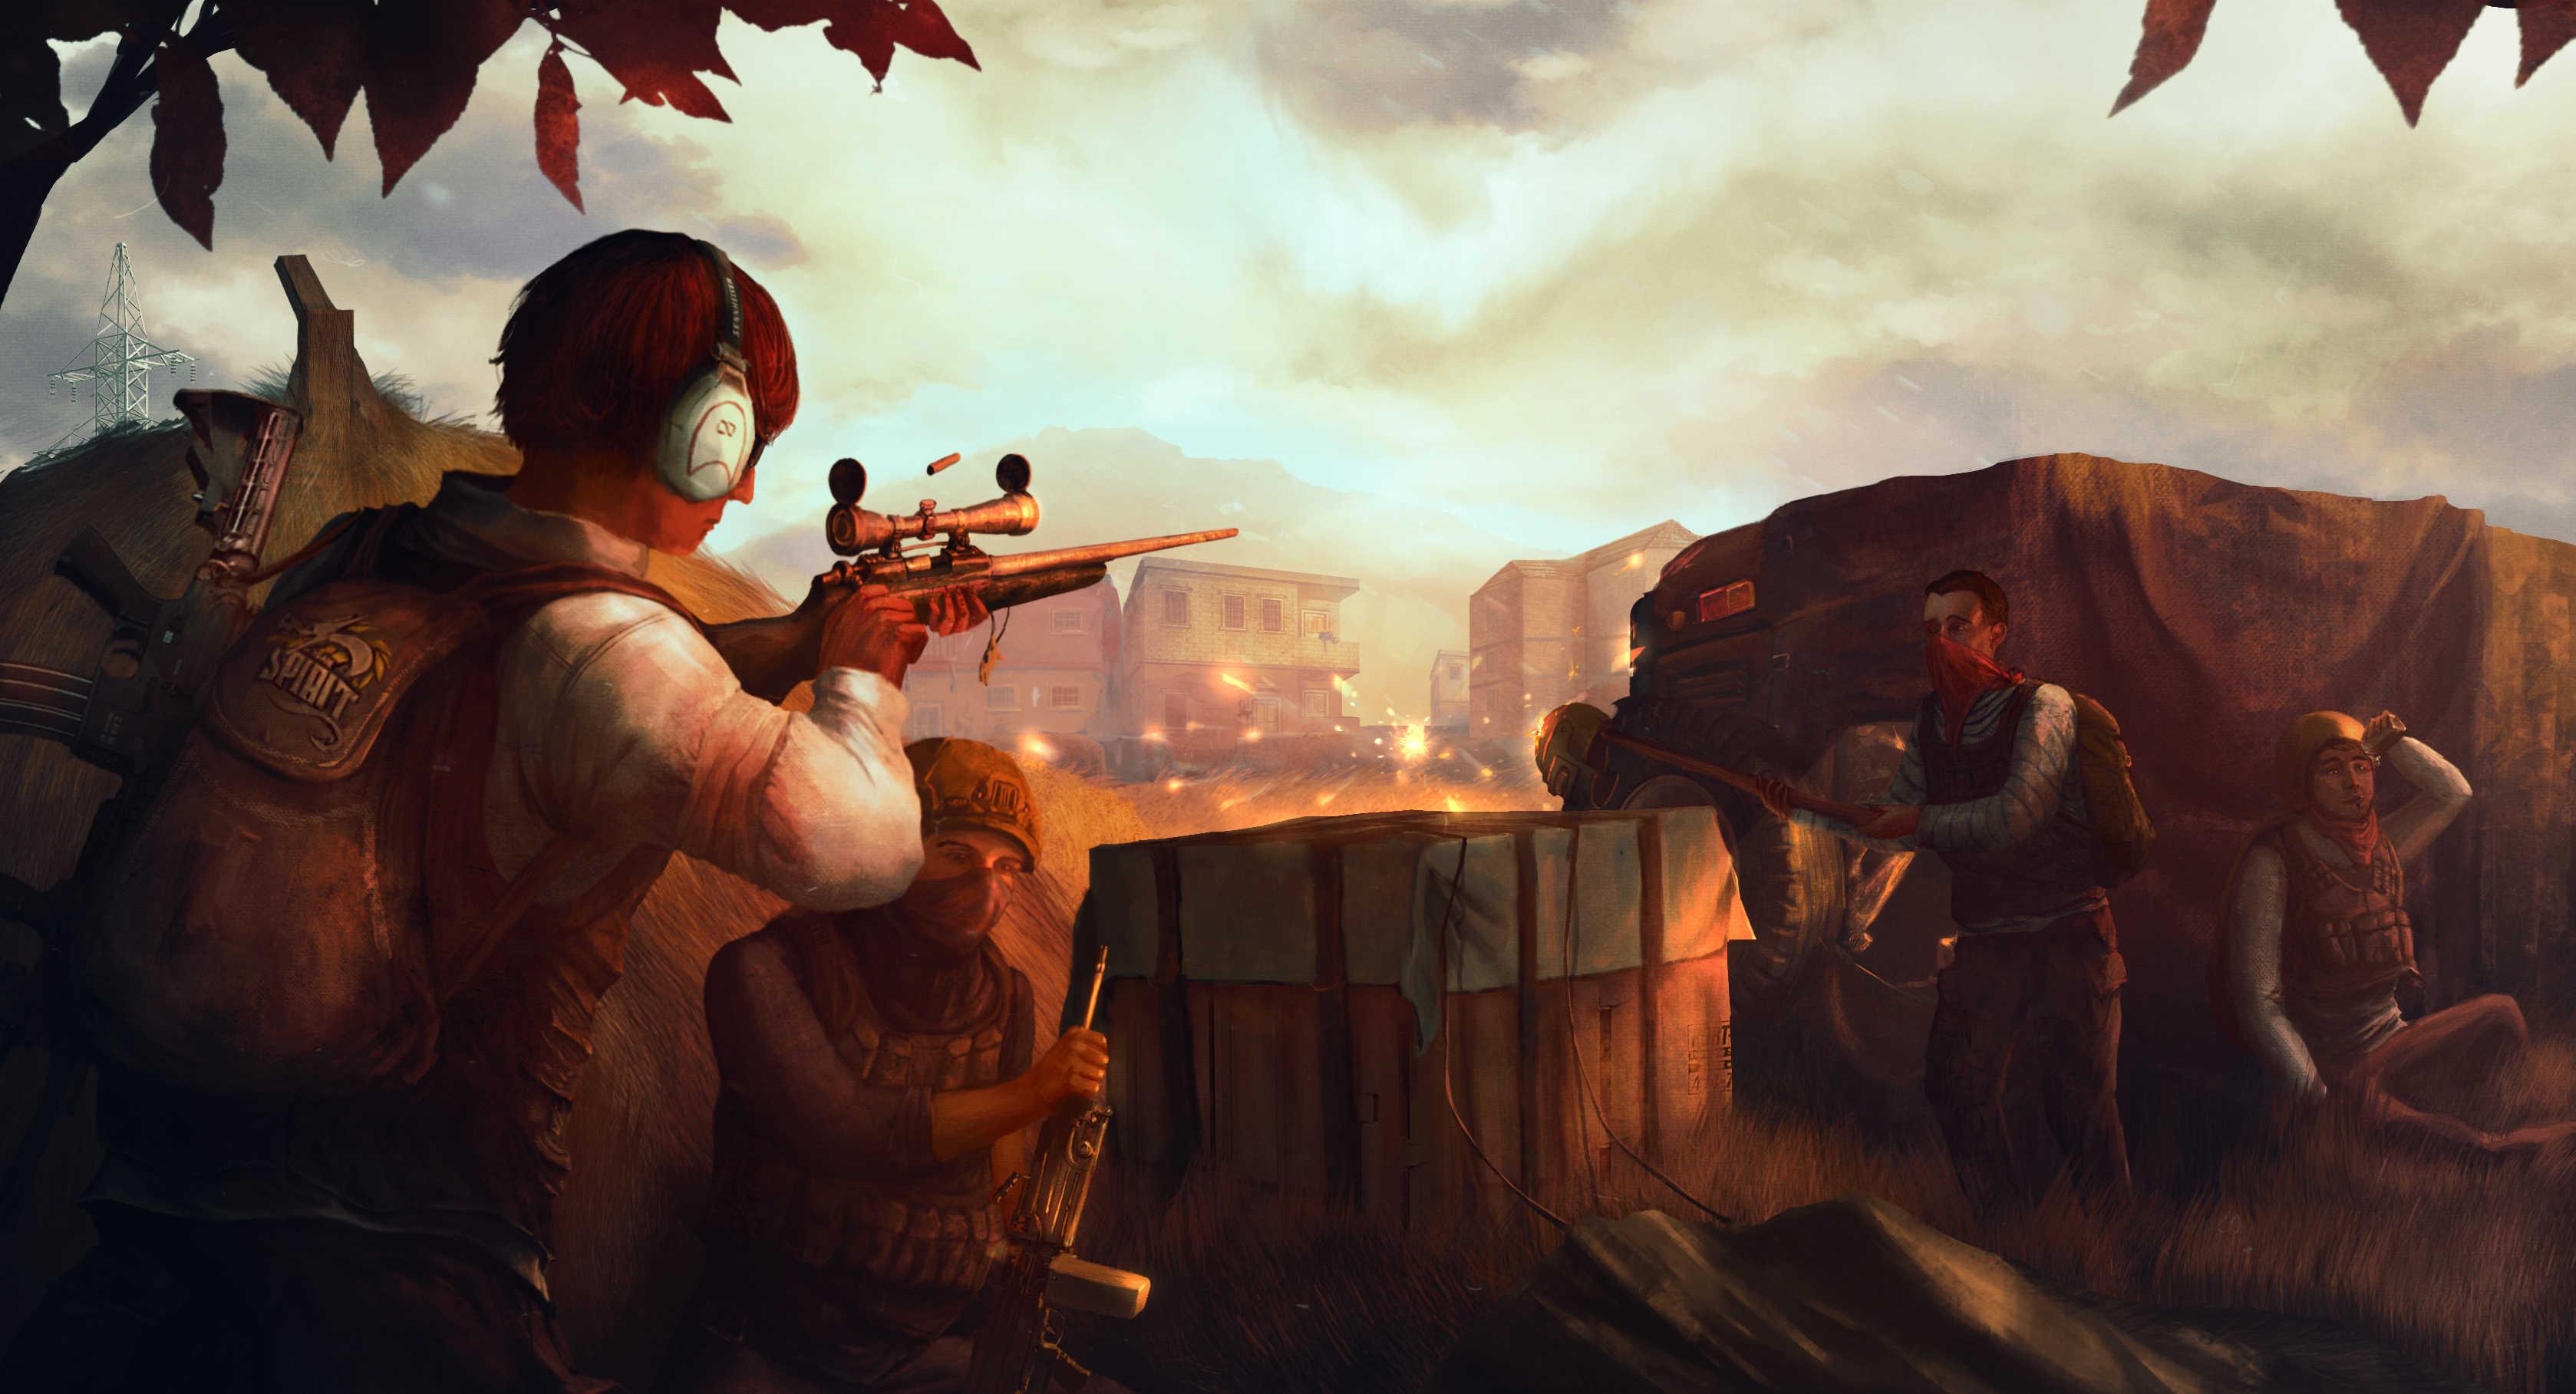 Downaload Pubg, Playerunknown's Battlegrounds